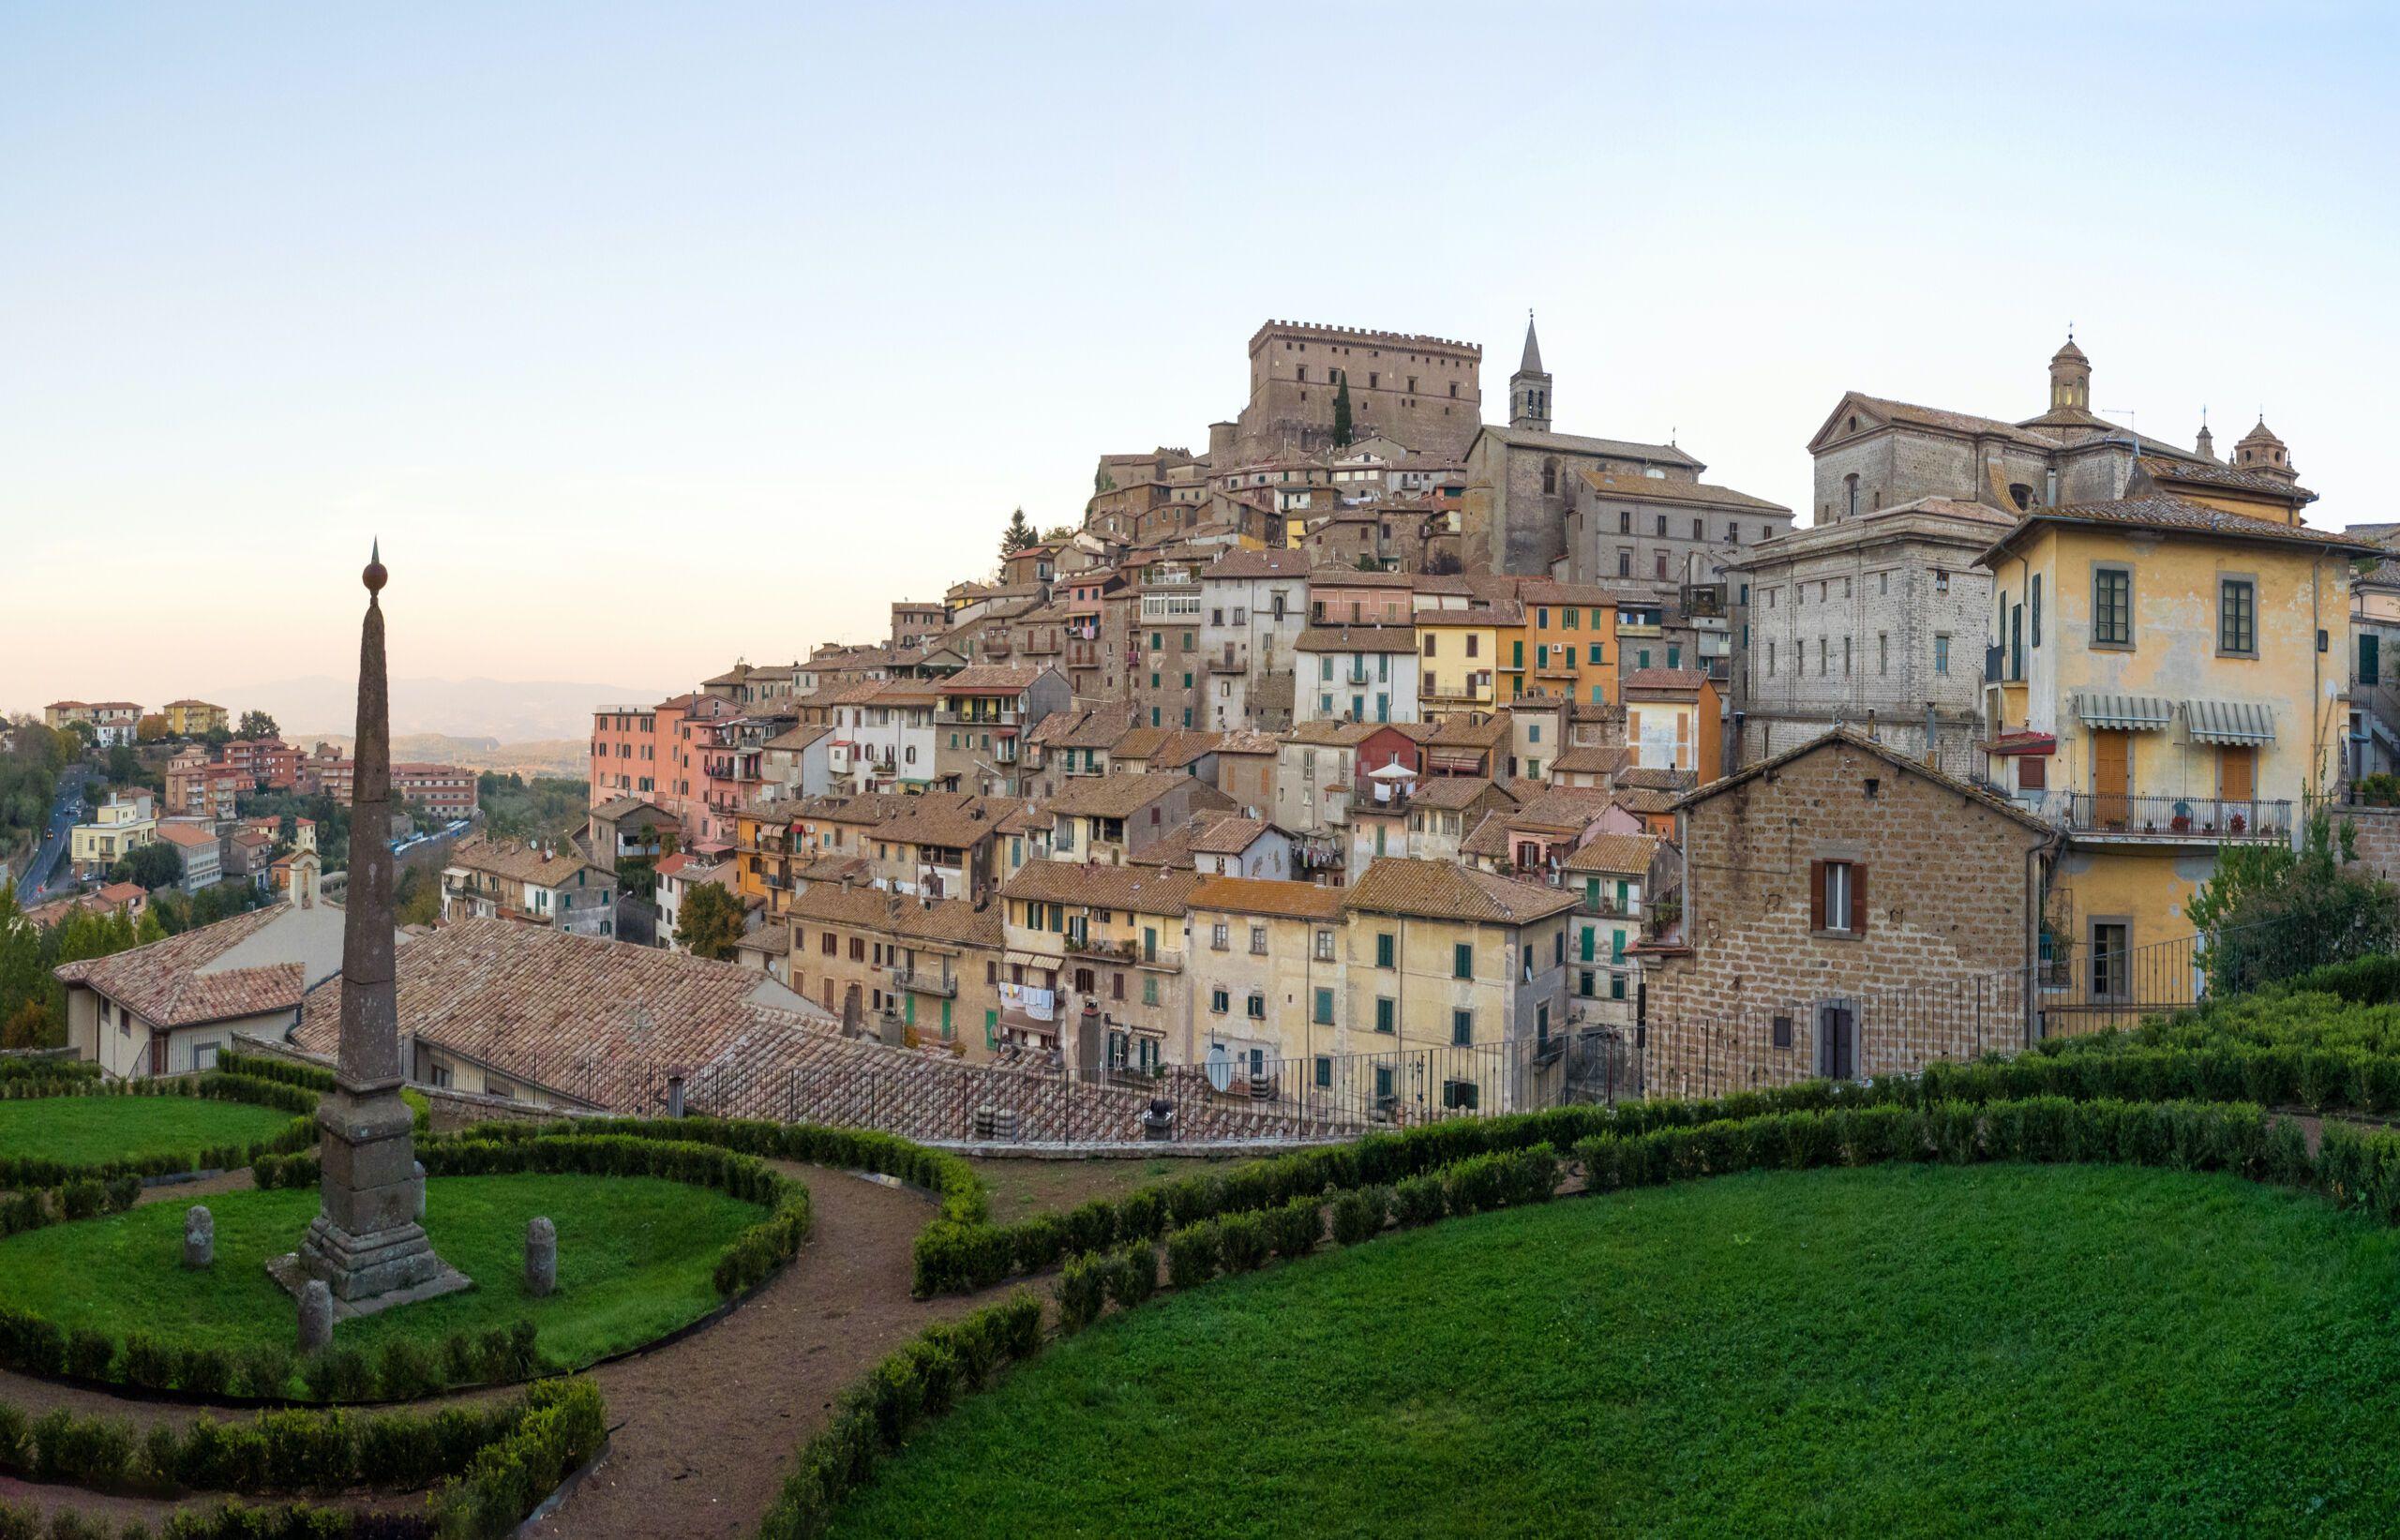 Soriano,Nel,Cimino,,Italy,-,17,October,2017,-,A, Tuscia town